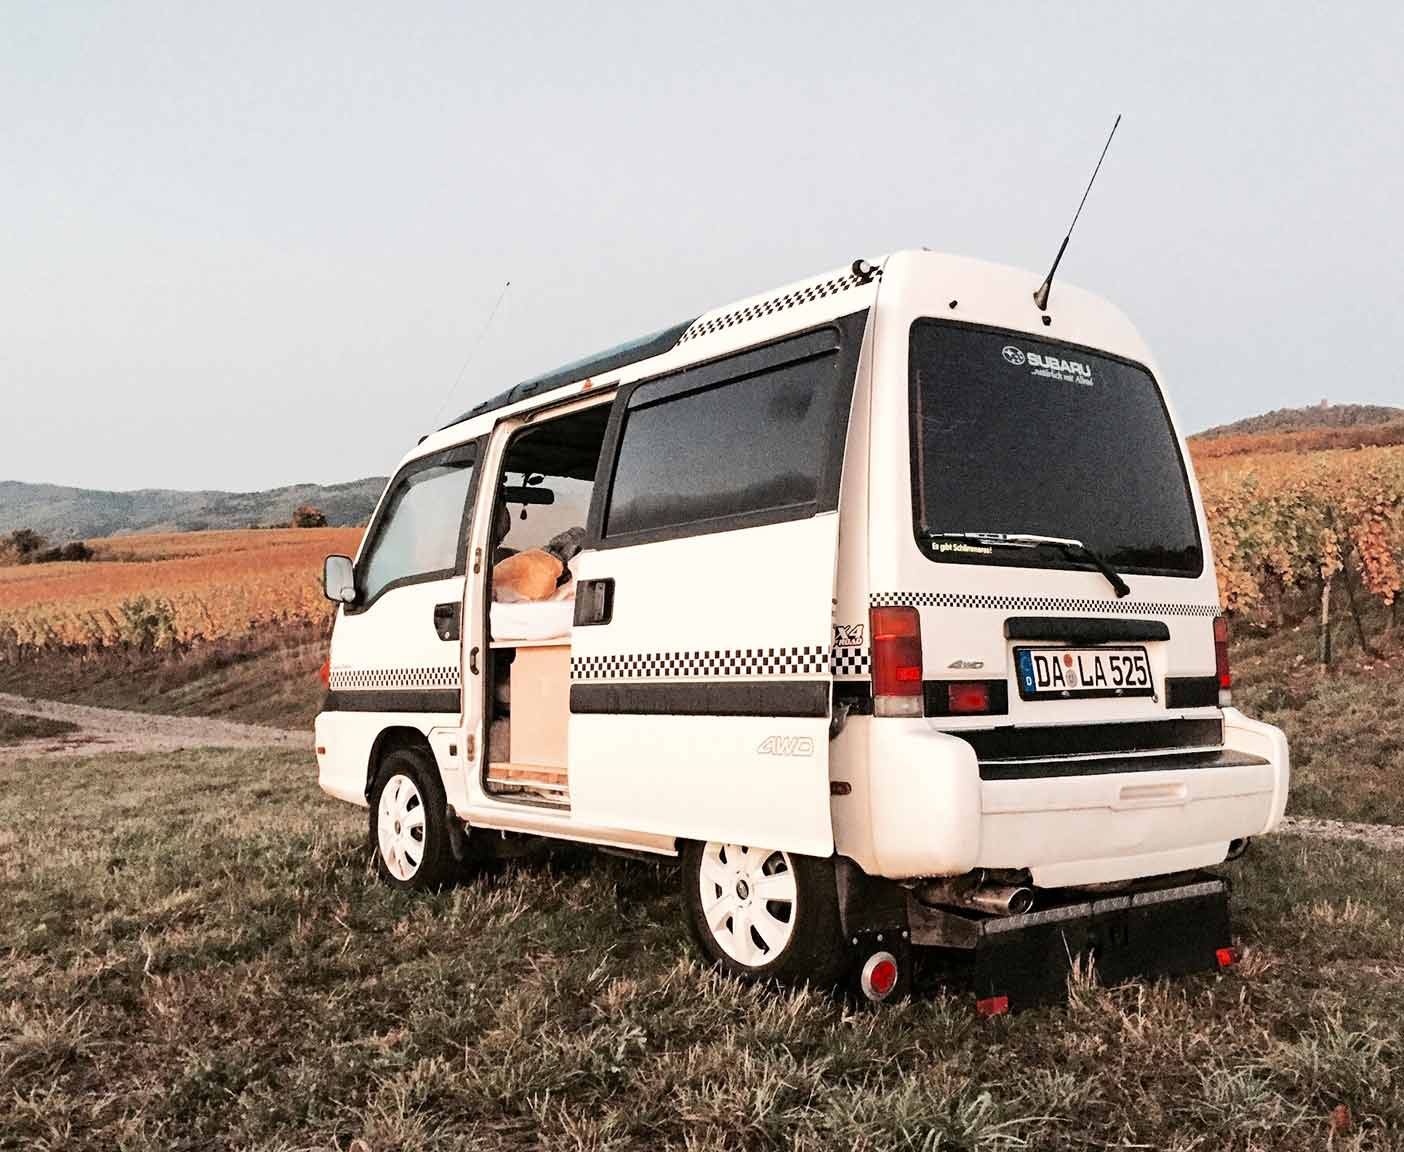 subaru-libero-wohnmobil-umbau-e10-4x4-allrad-camper-minicamper-daihatsu-hijet-piaggio-porter-2